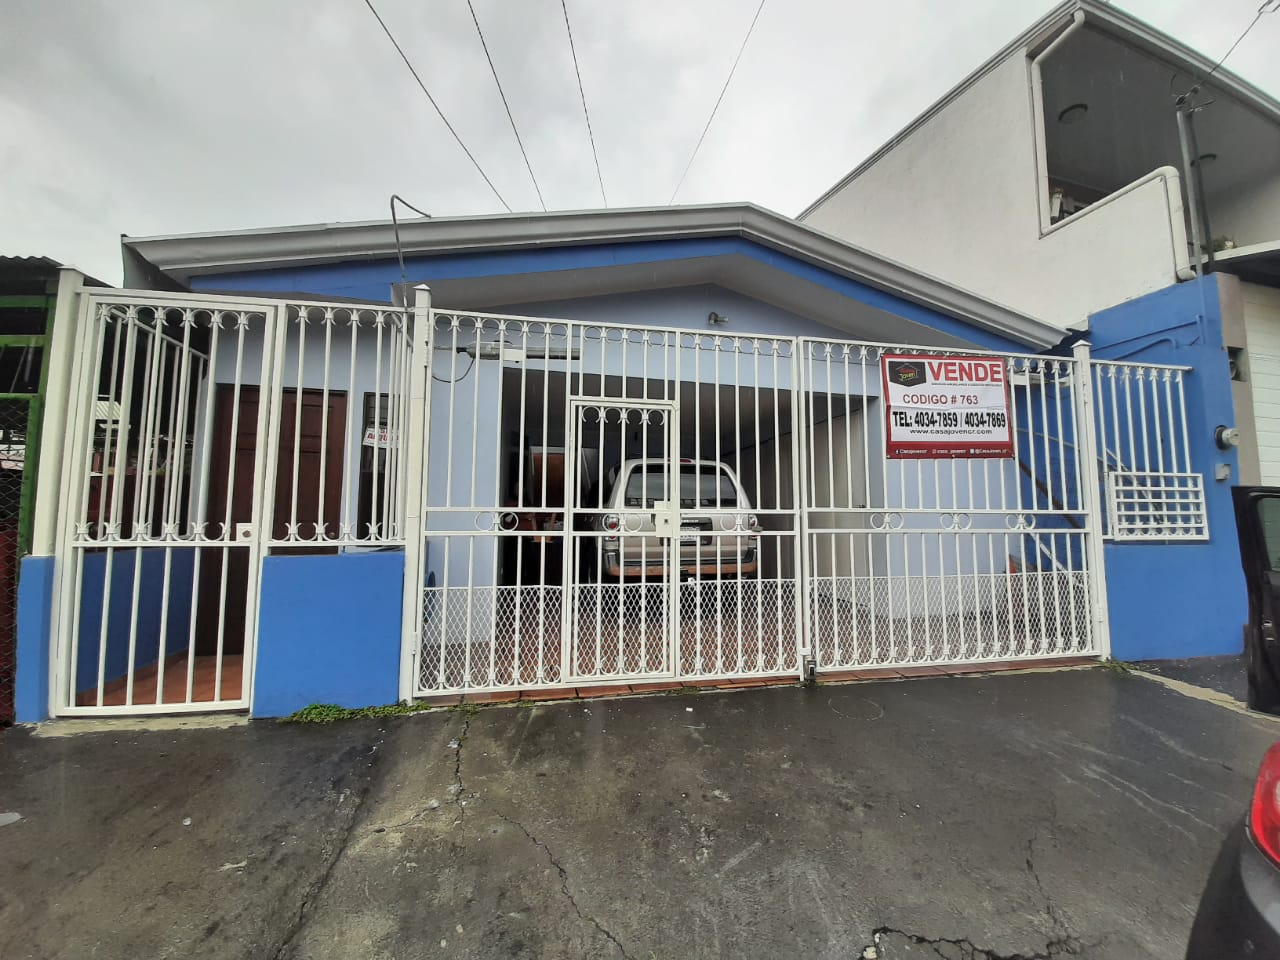 763 Se vende casa en San Pedro de Barva de Heredia.